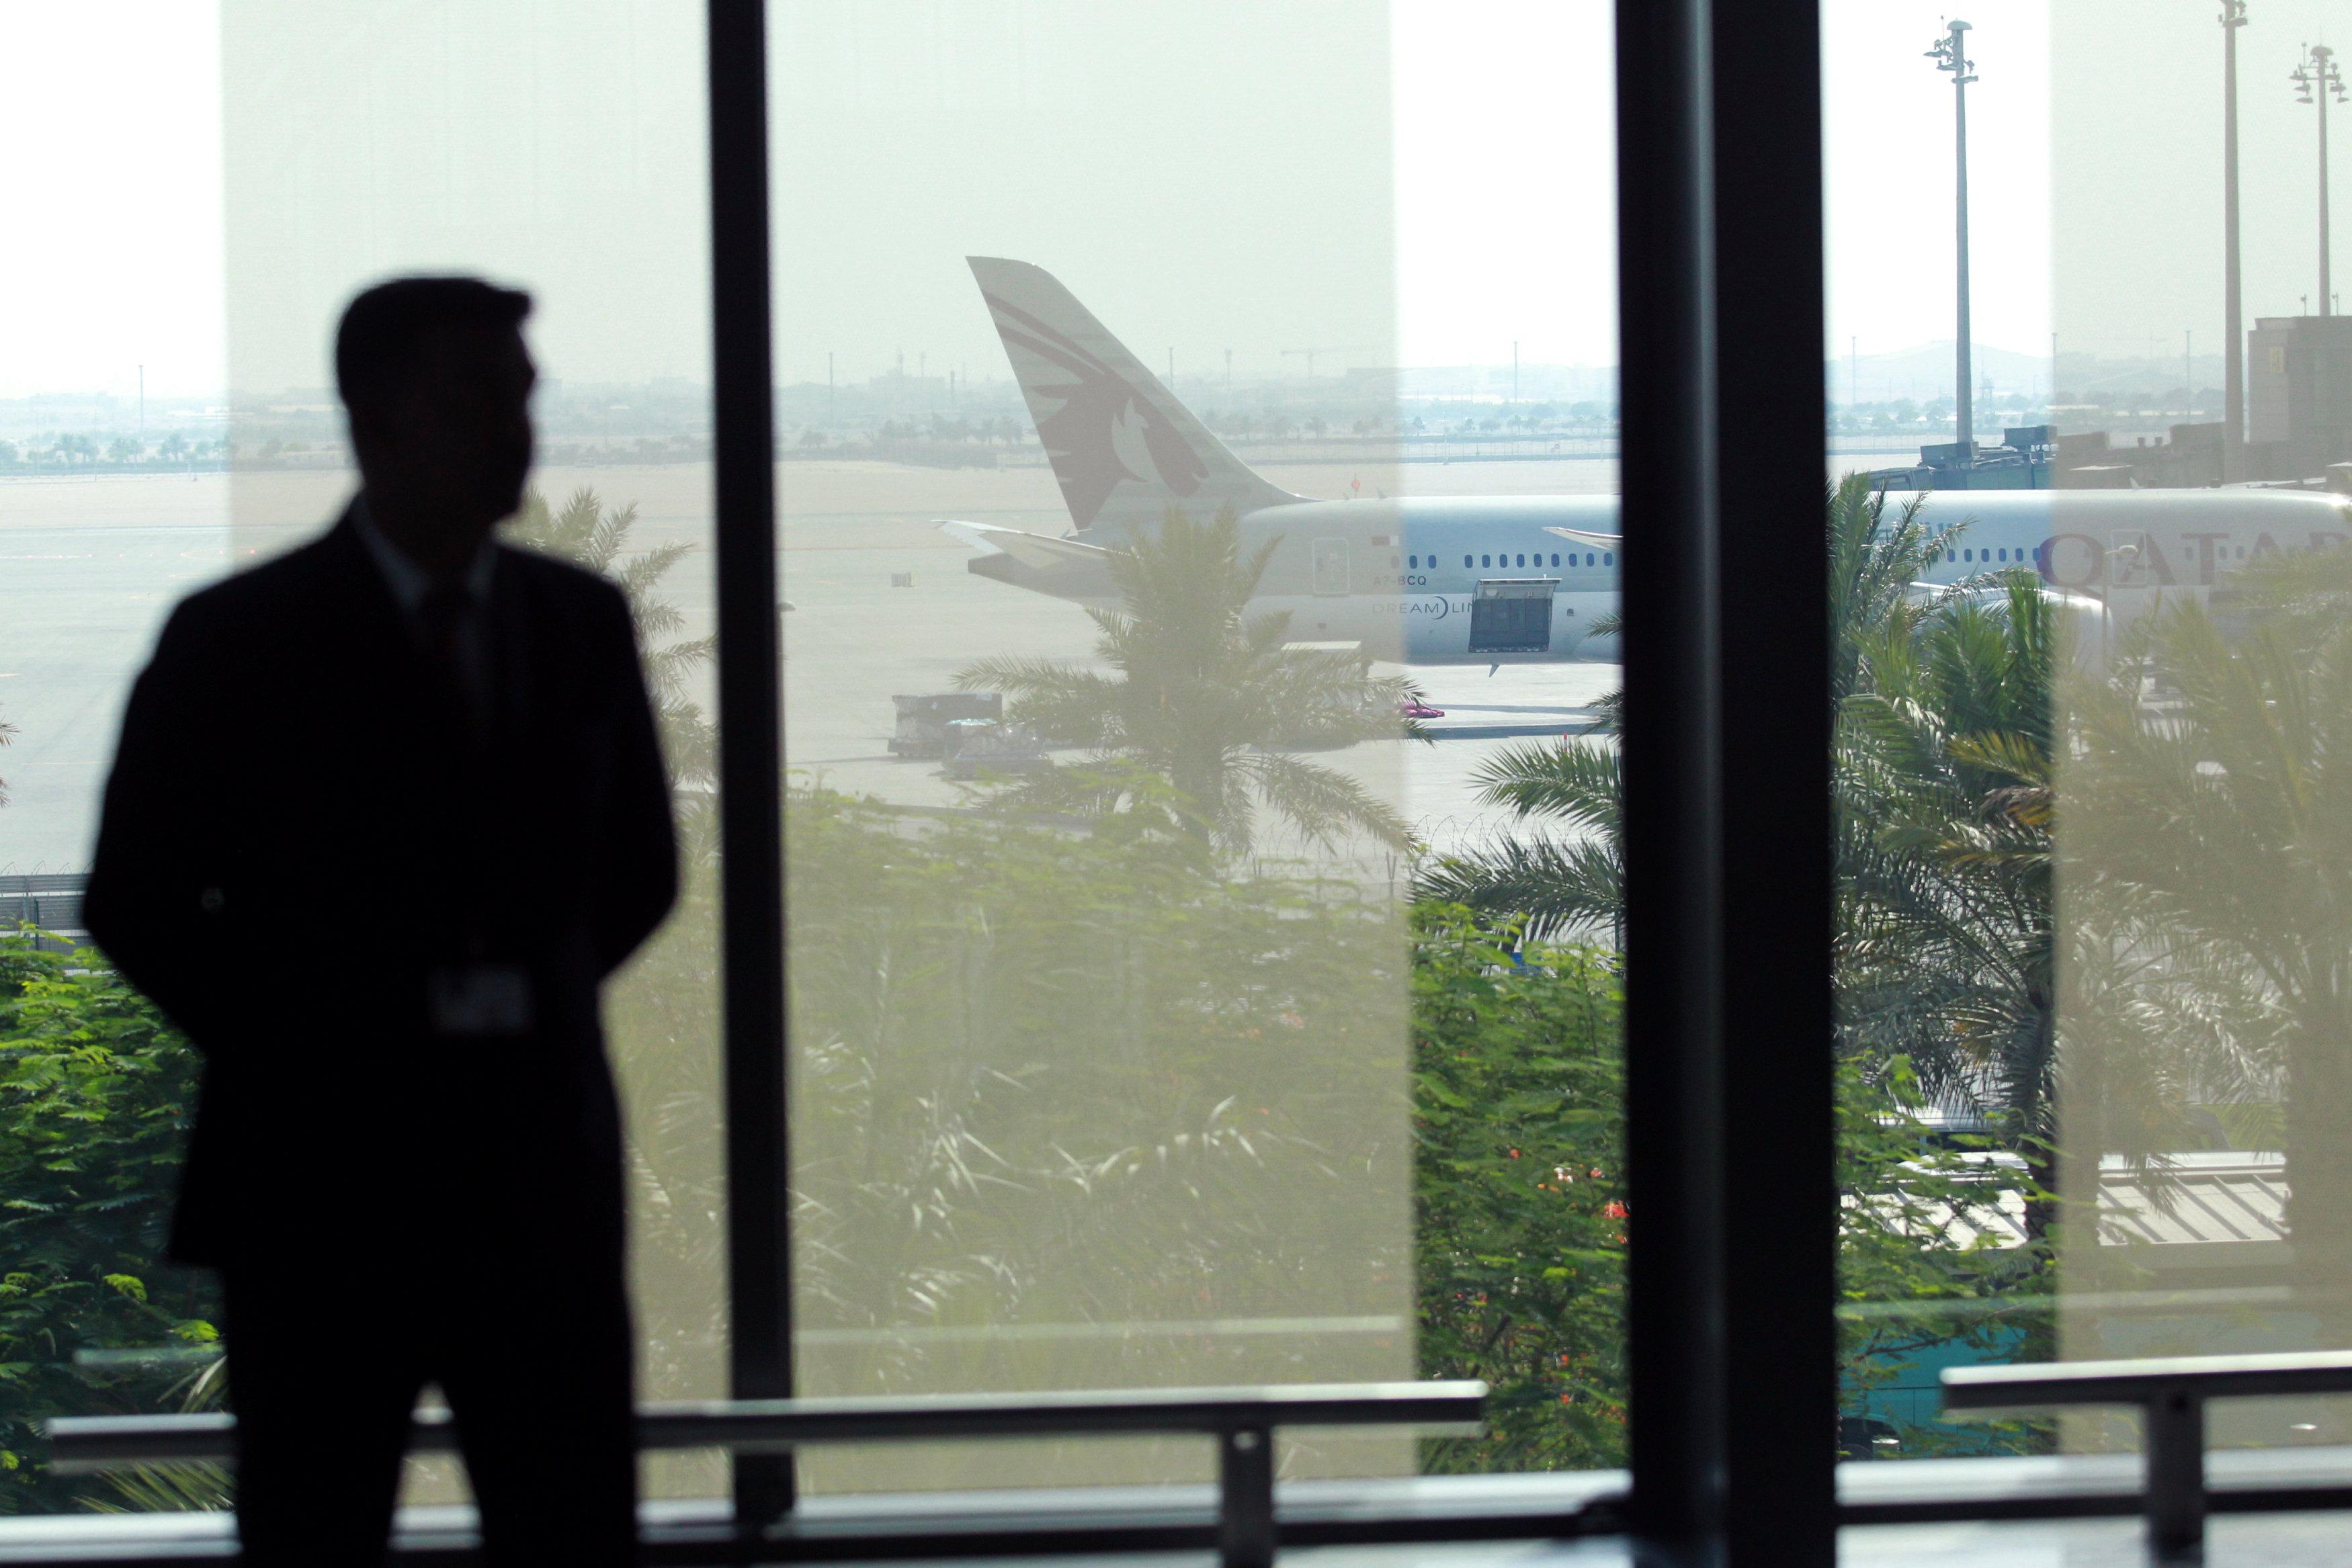 A staff memeber stands at Hamad International Airport in Doha, Qatar on June 7, 2017. (REUTERS/Naseem Zeitoon)